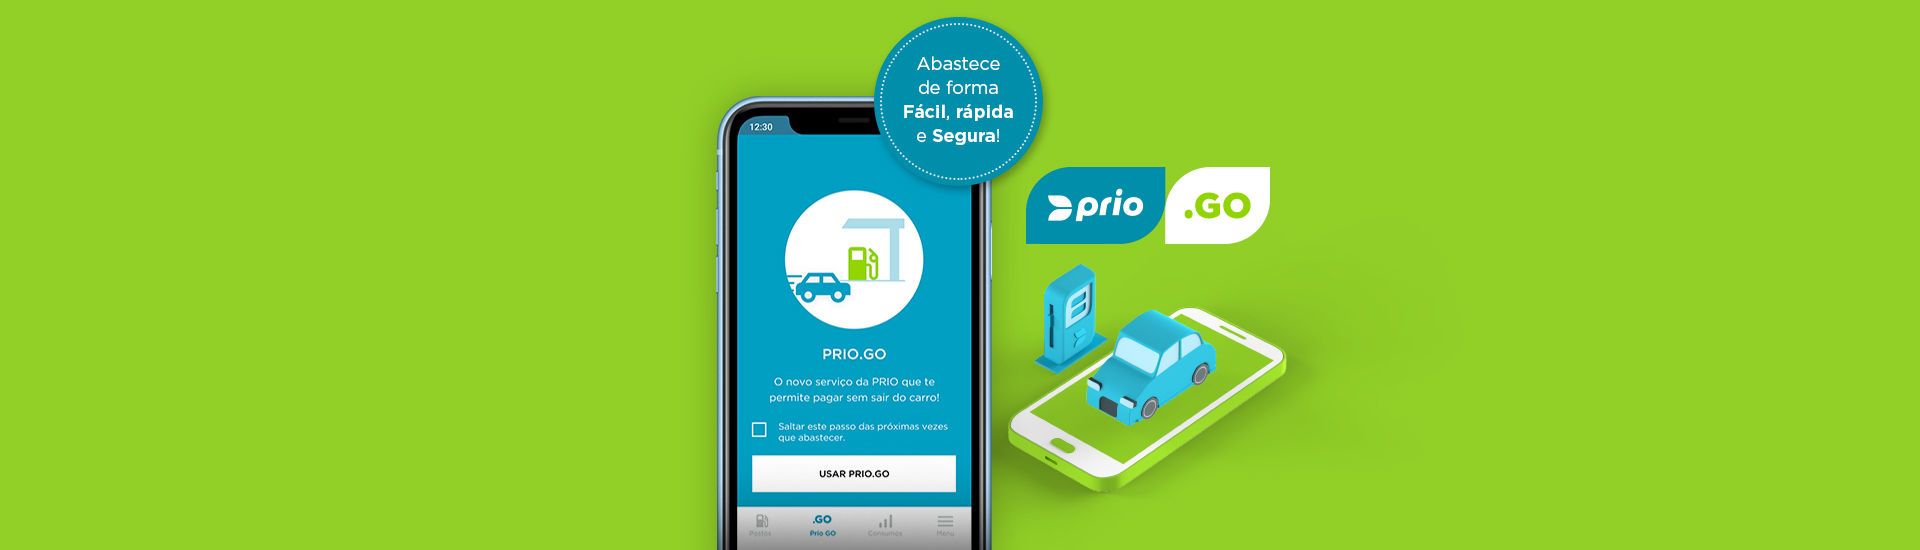 APP PRIO.GO